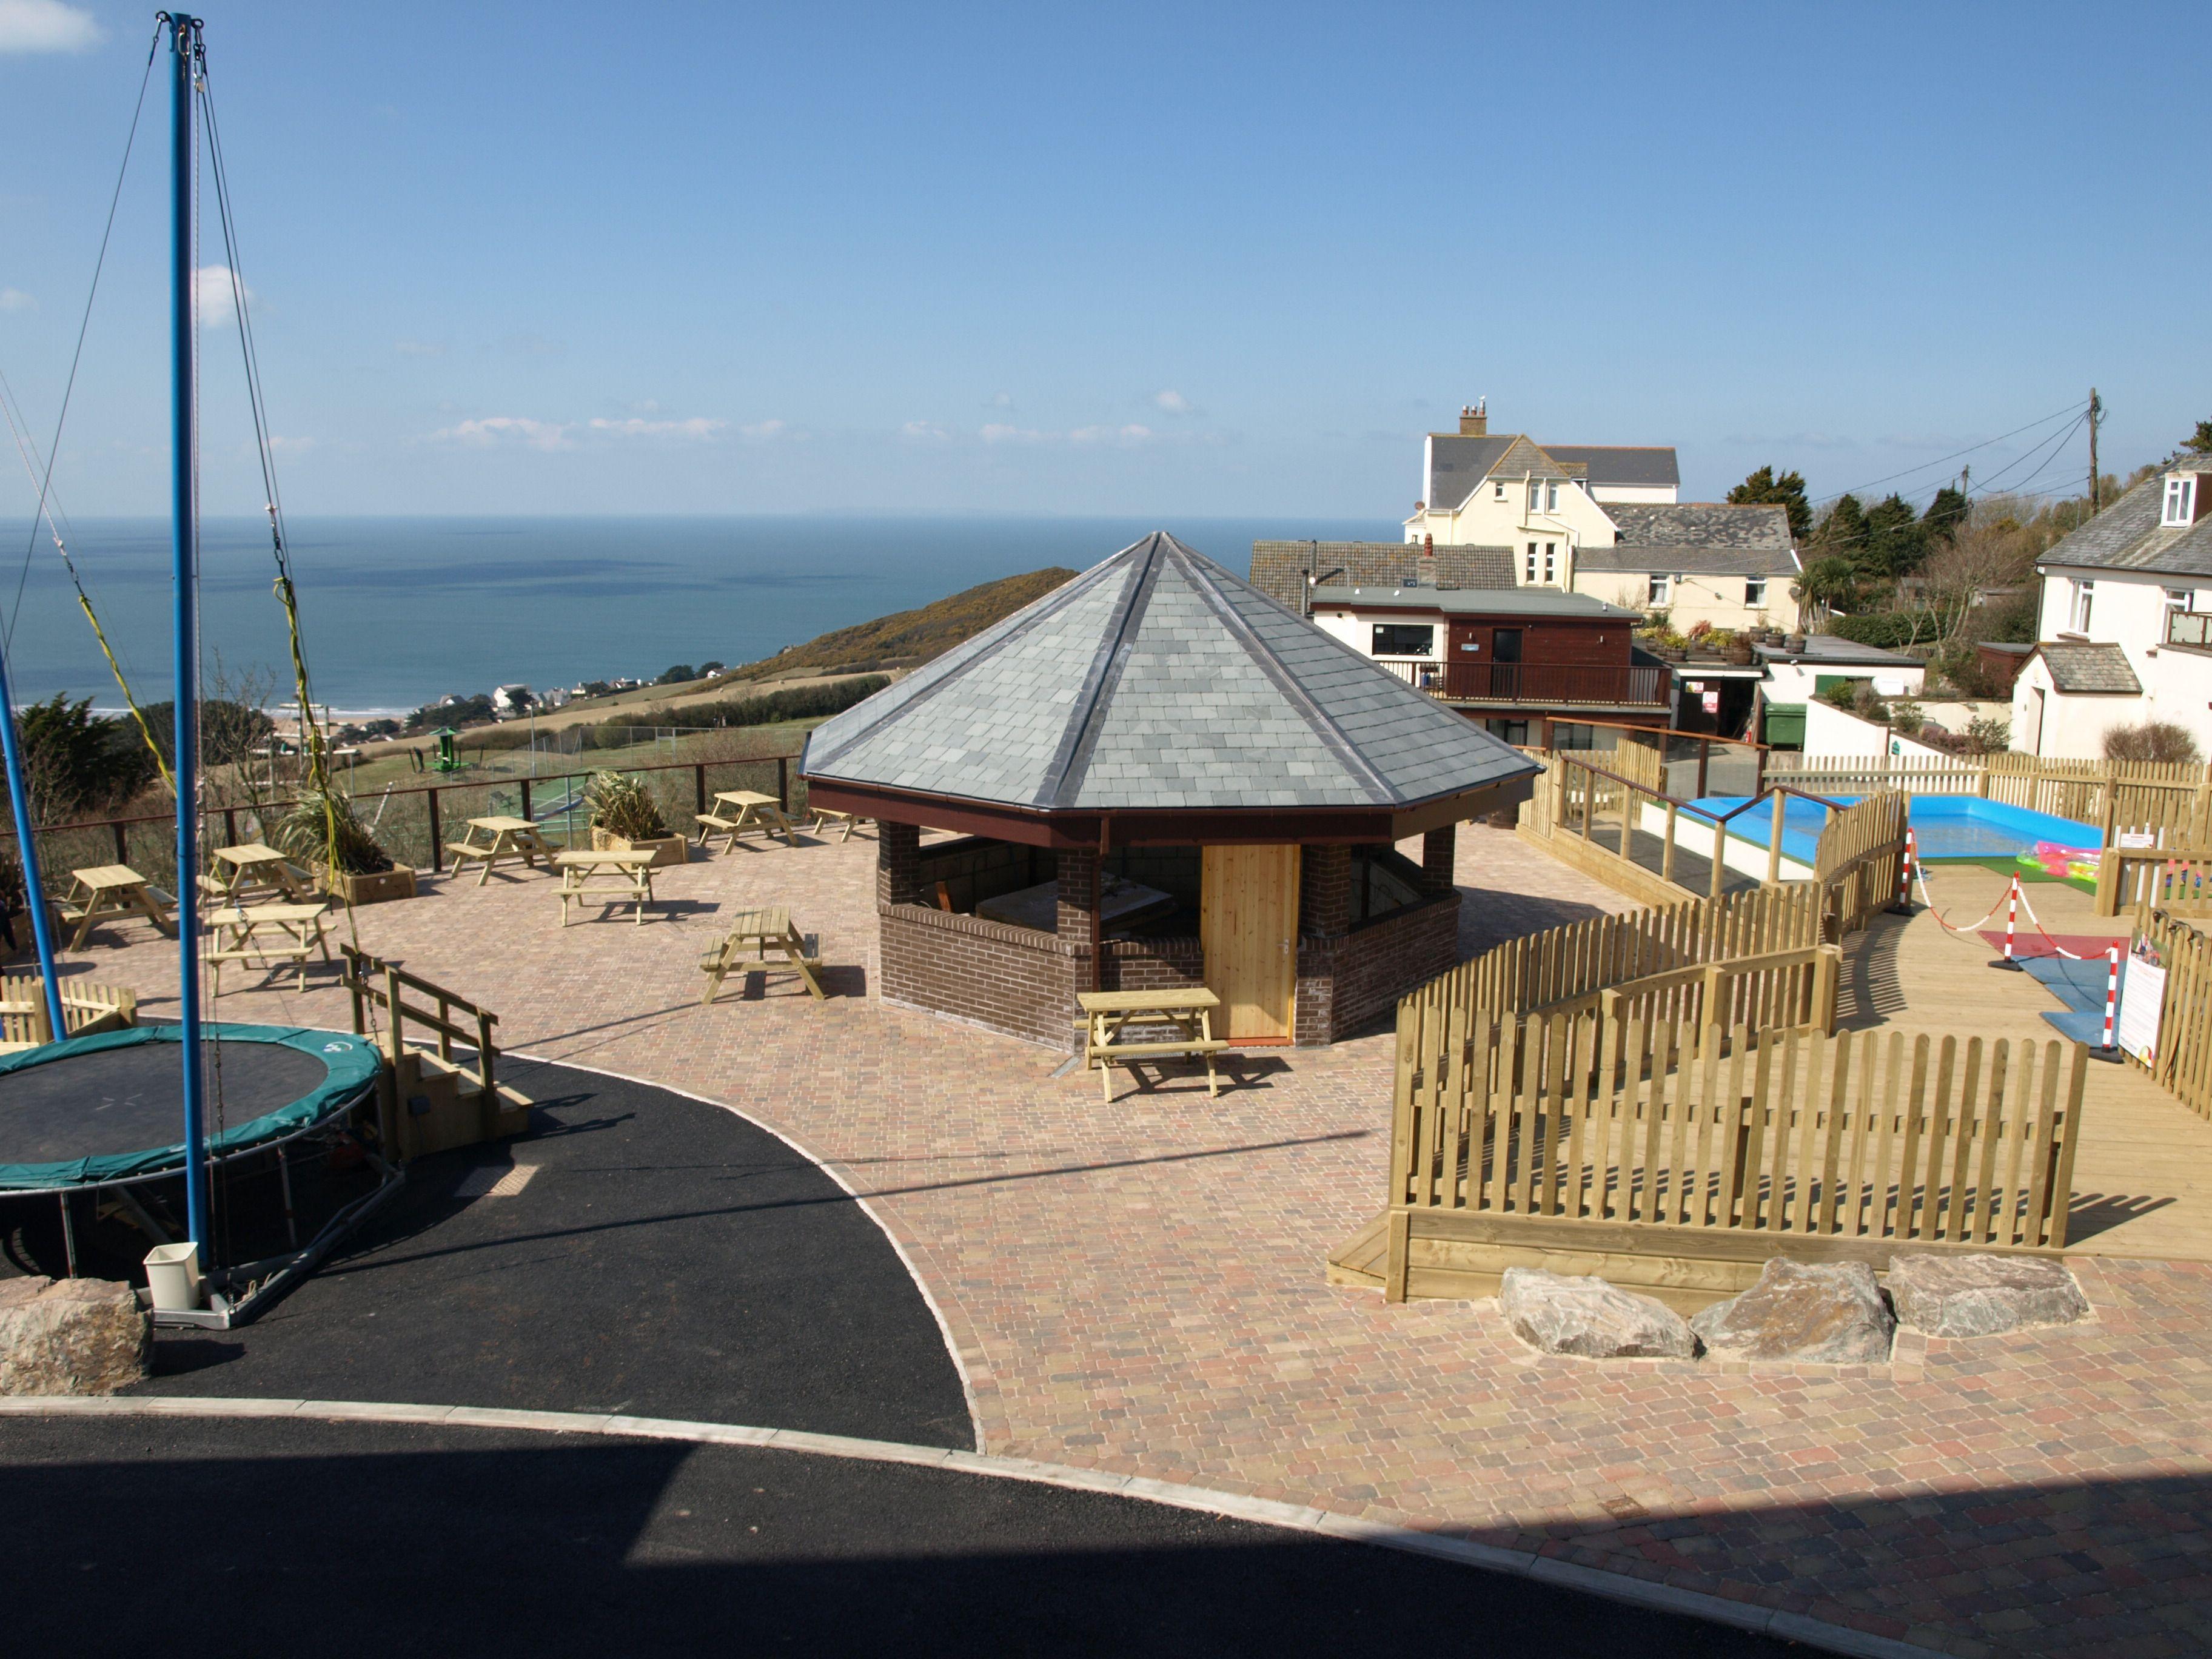 New Ex34 Extreme Sports Area At Woolacombe Bay Holiday Village Holiday Village Patio Umbrella Outdoor Decor